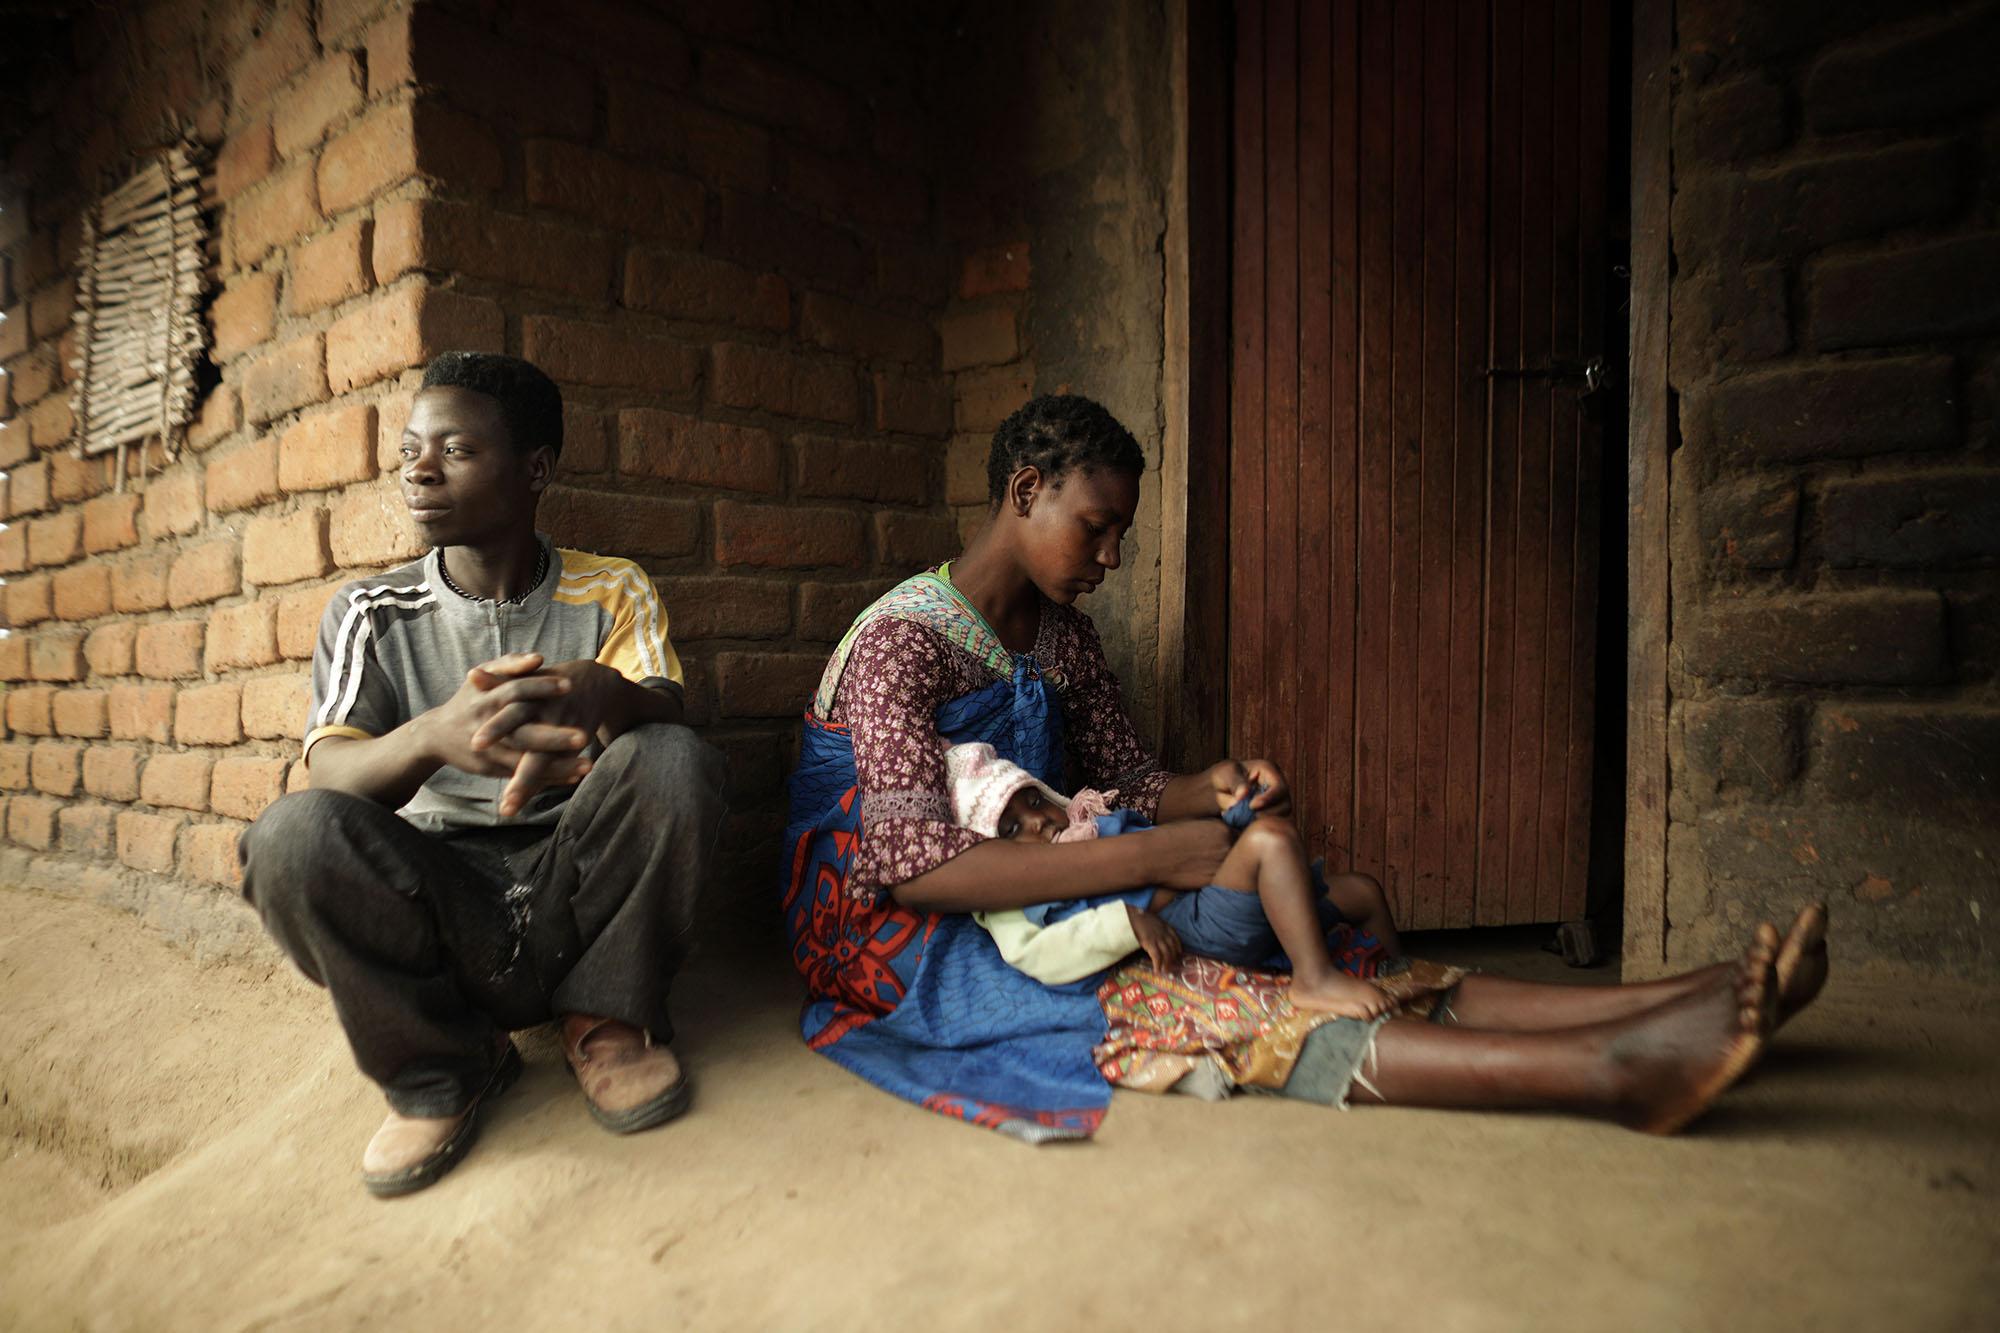 Mariam Chinguwo holds her daughter, Maness, while her husband, Hastings Sandikonda, looks on.